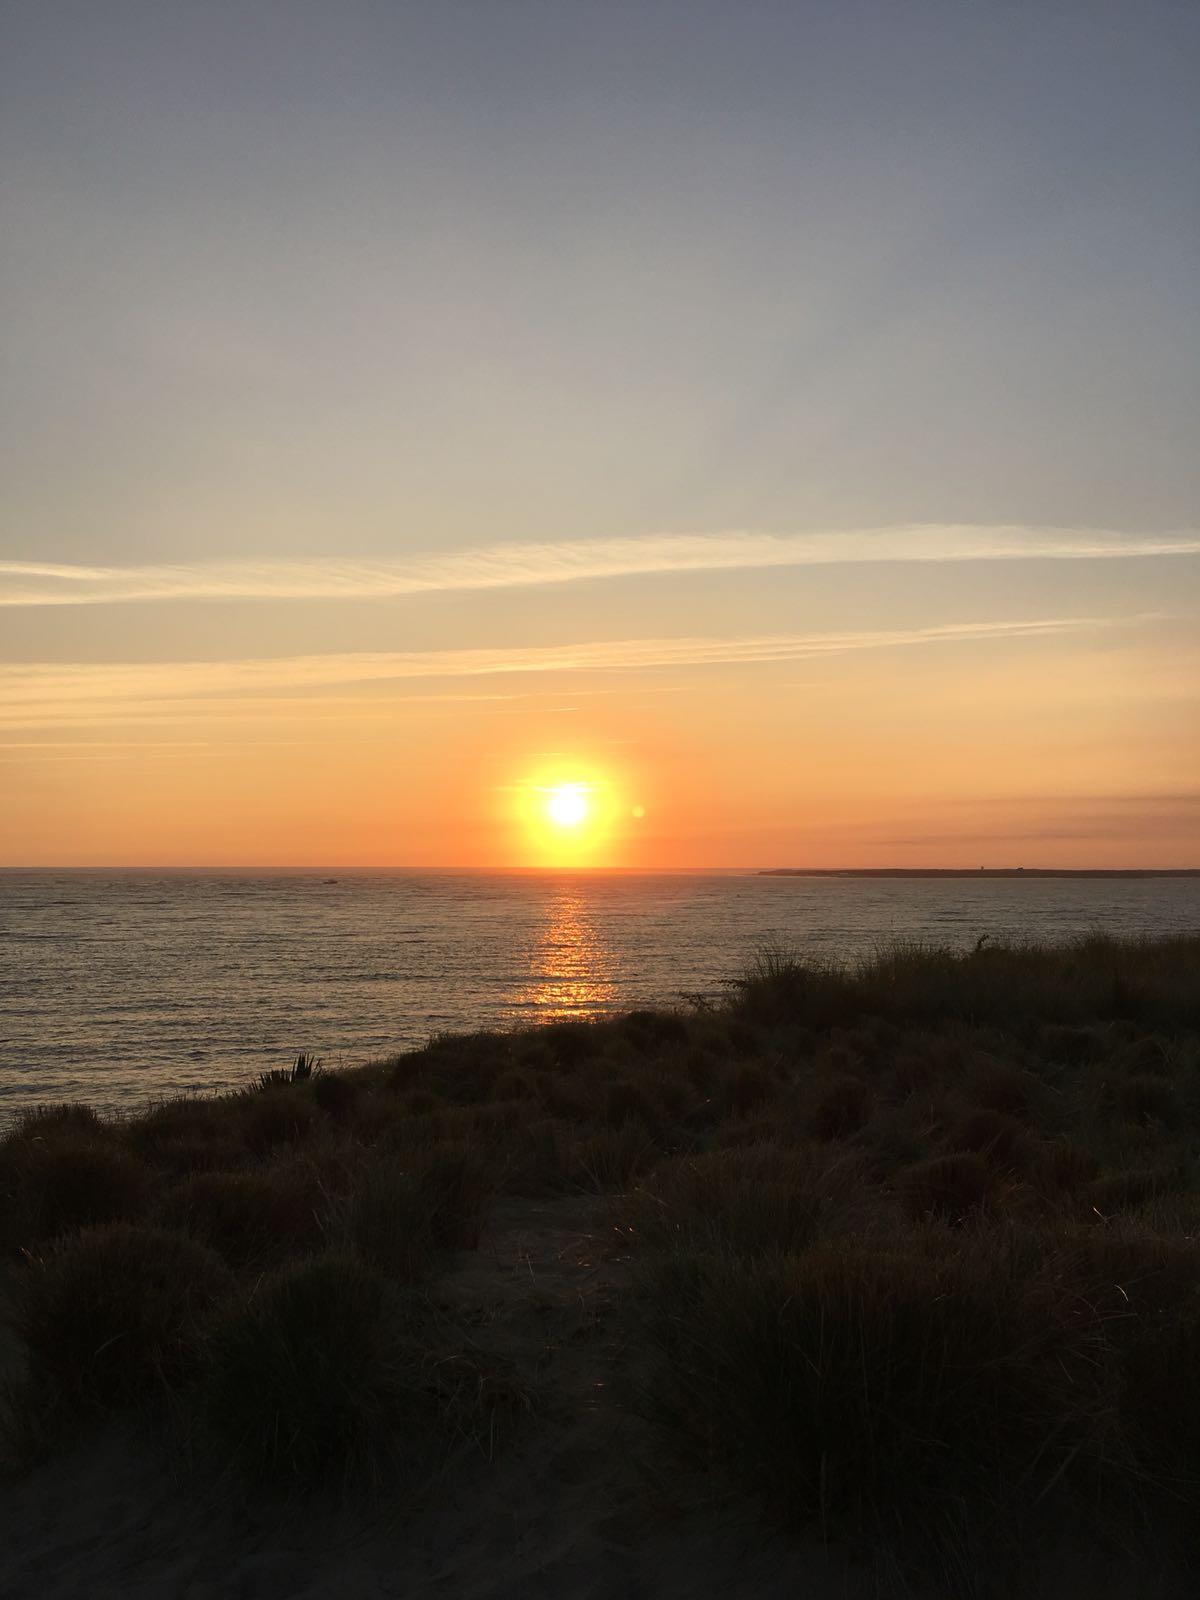 Sonnenuntergang in Brasilien auf dem GFK Seminar